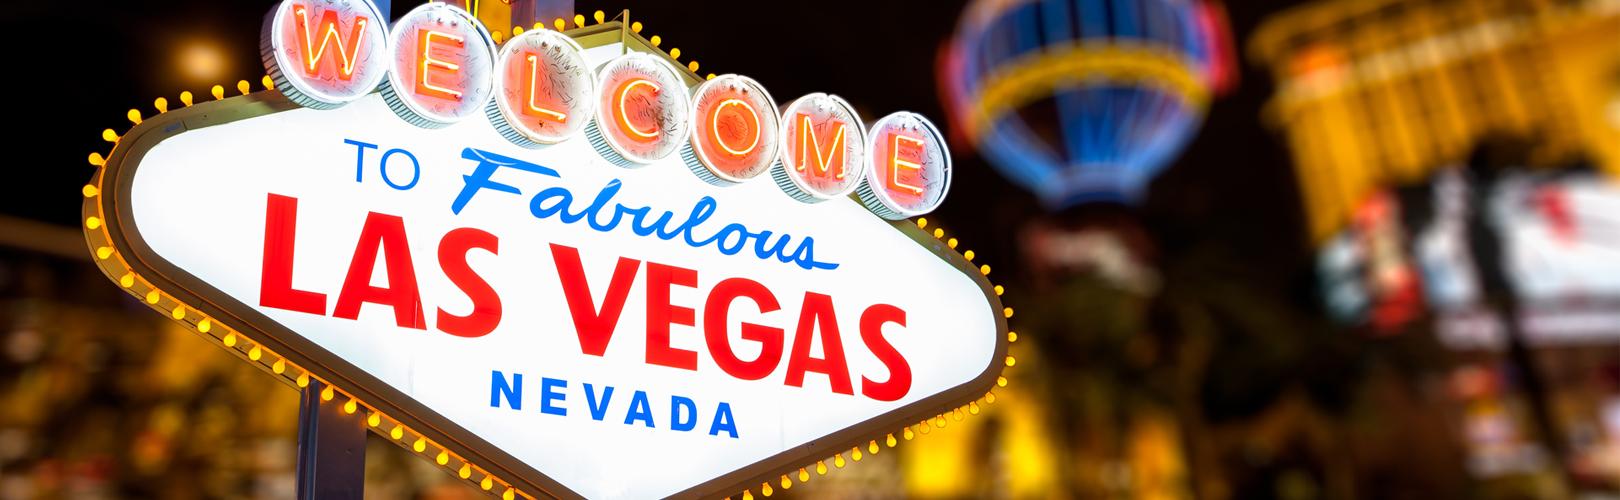 4 days in Vegas